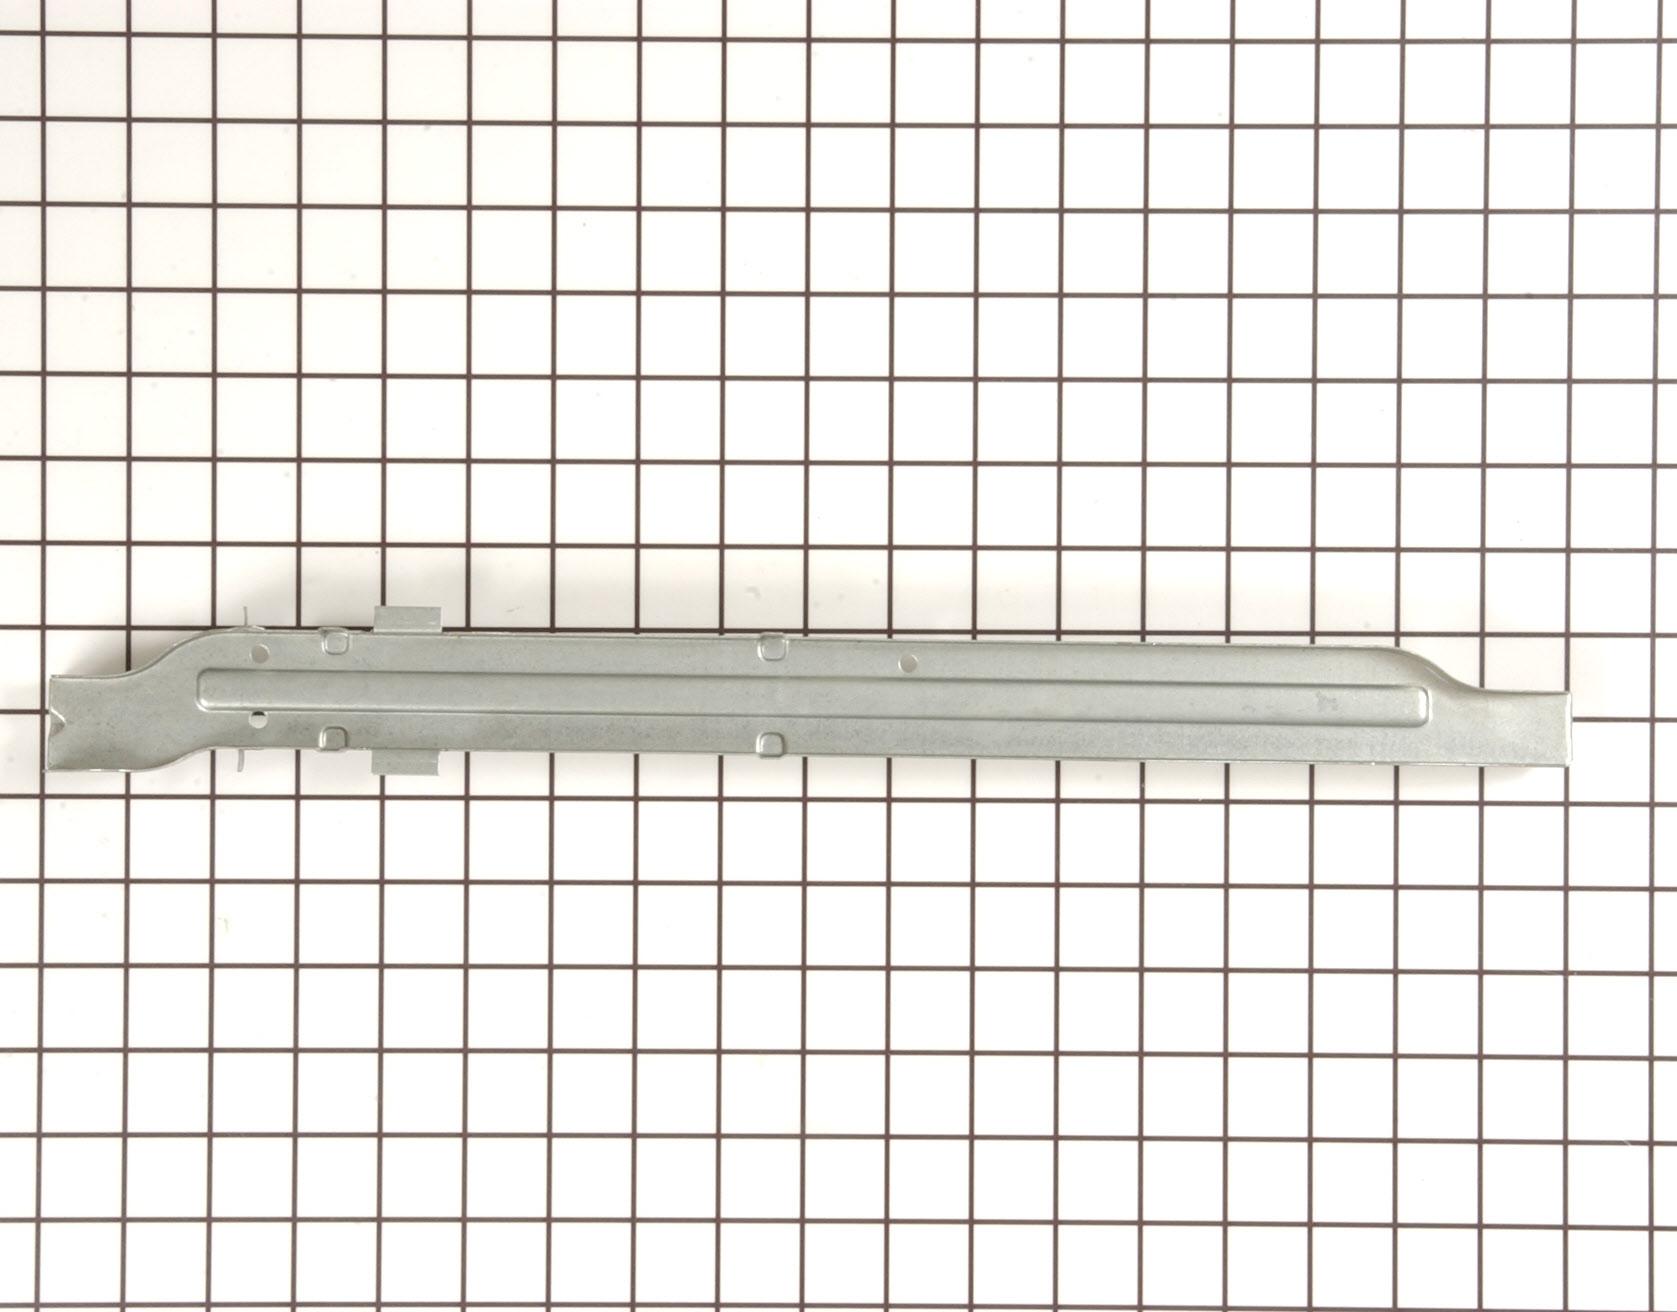 Maytag Range/Stove/Oven Part # 98004629 - Fastener